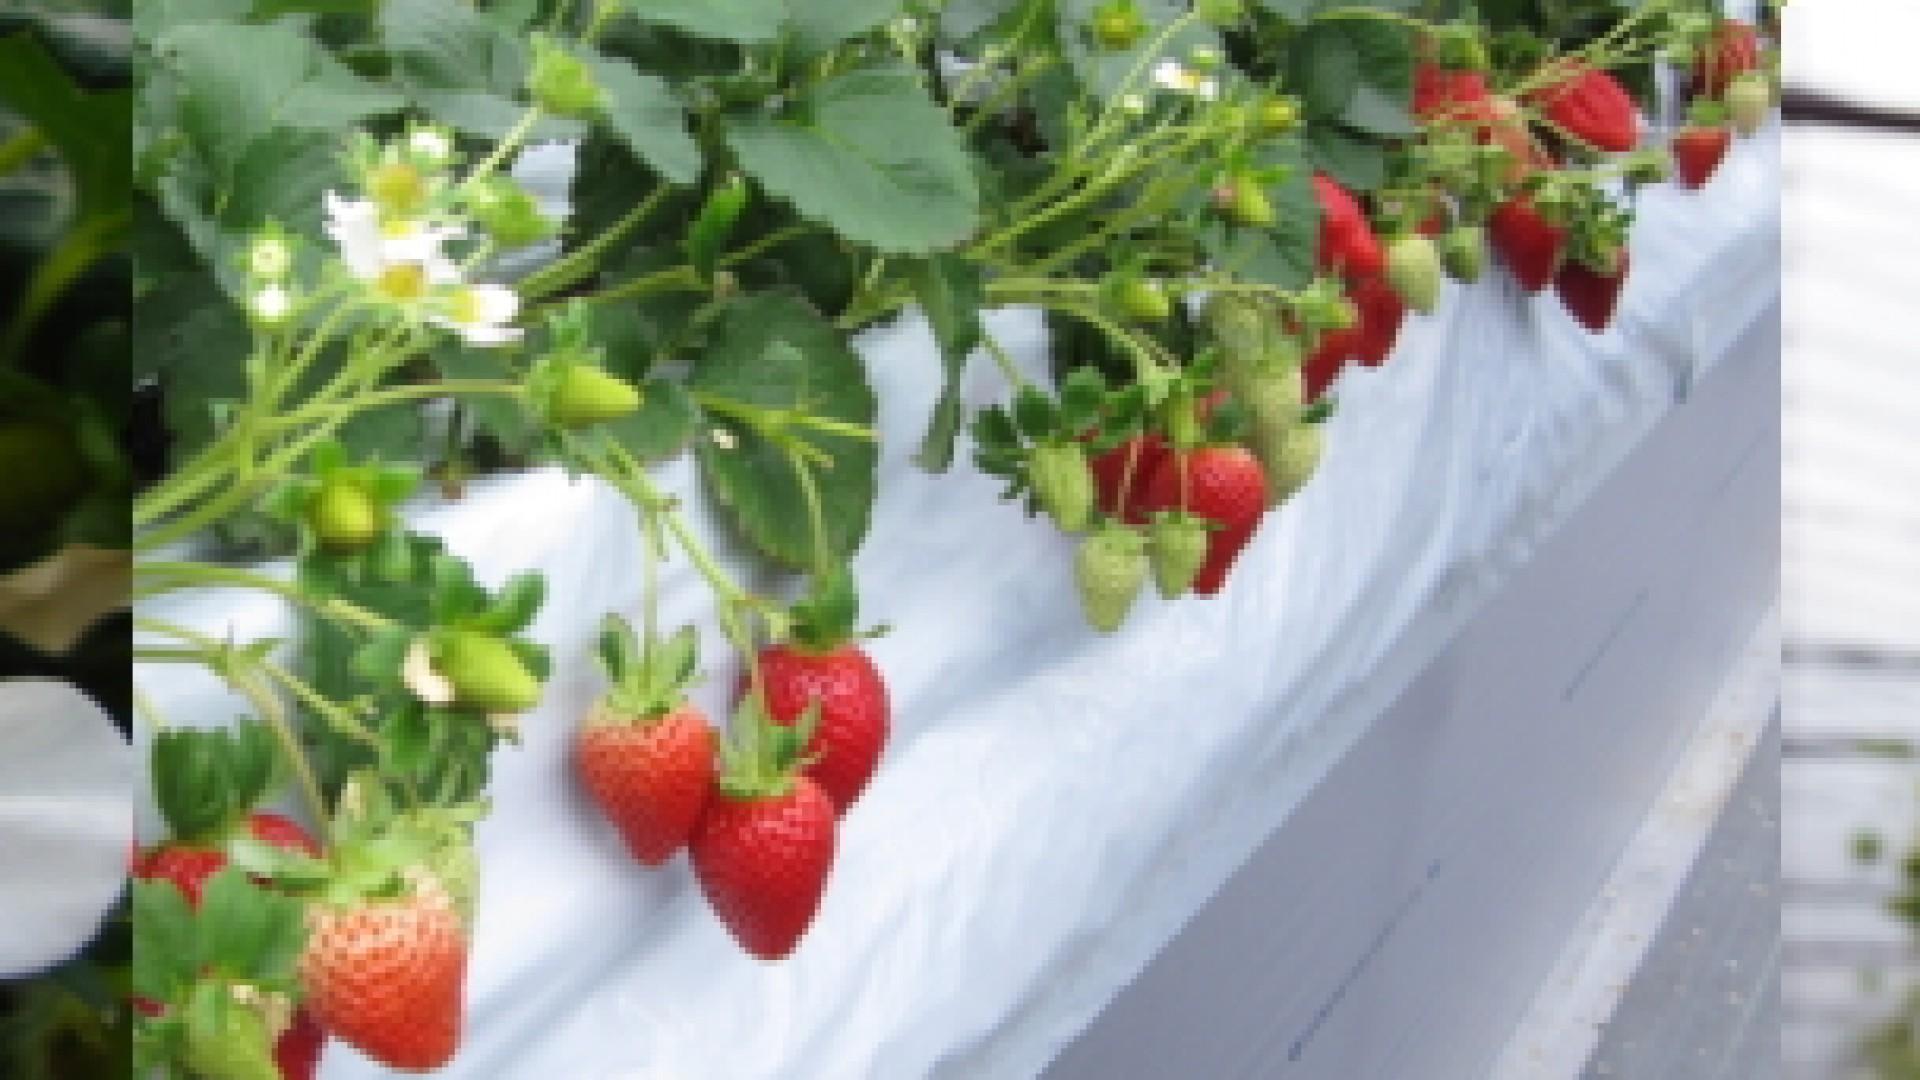 Katano Erdbeerfarm